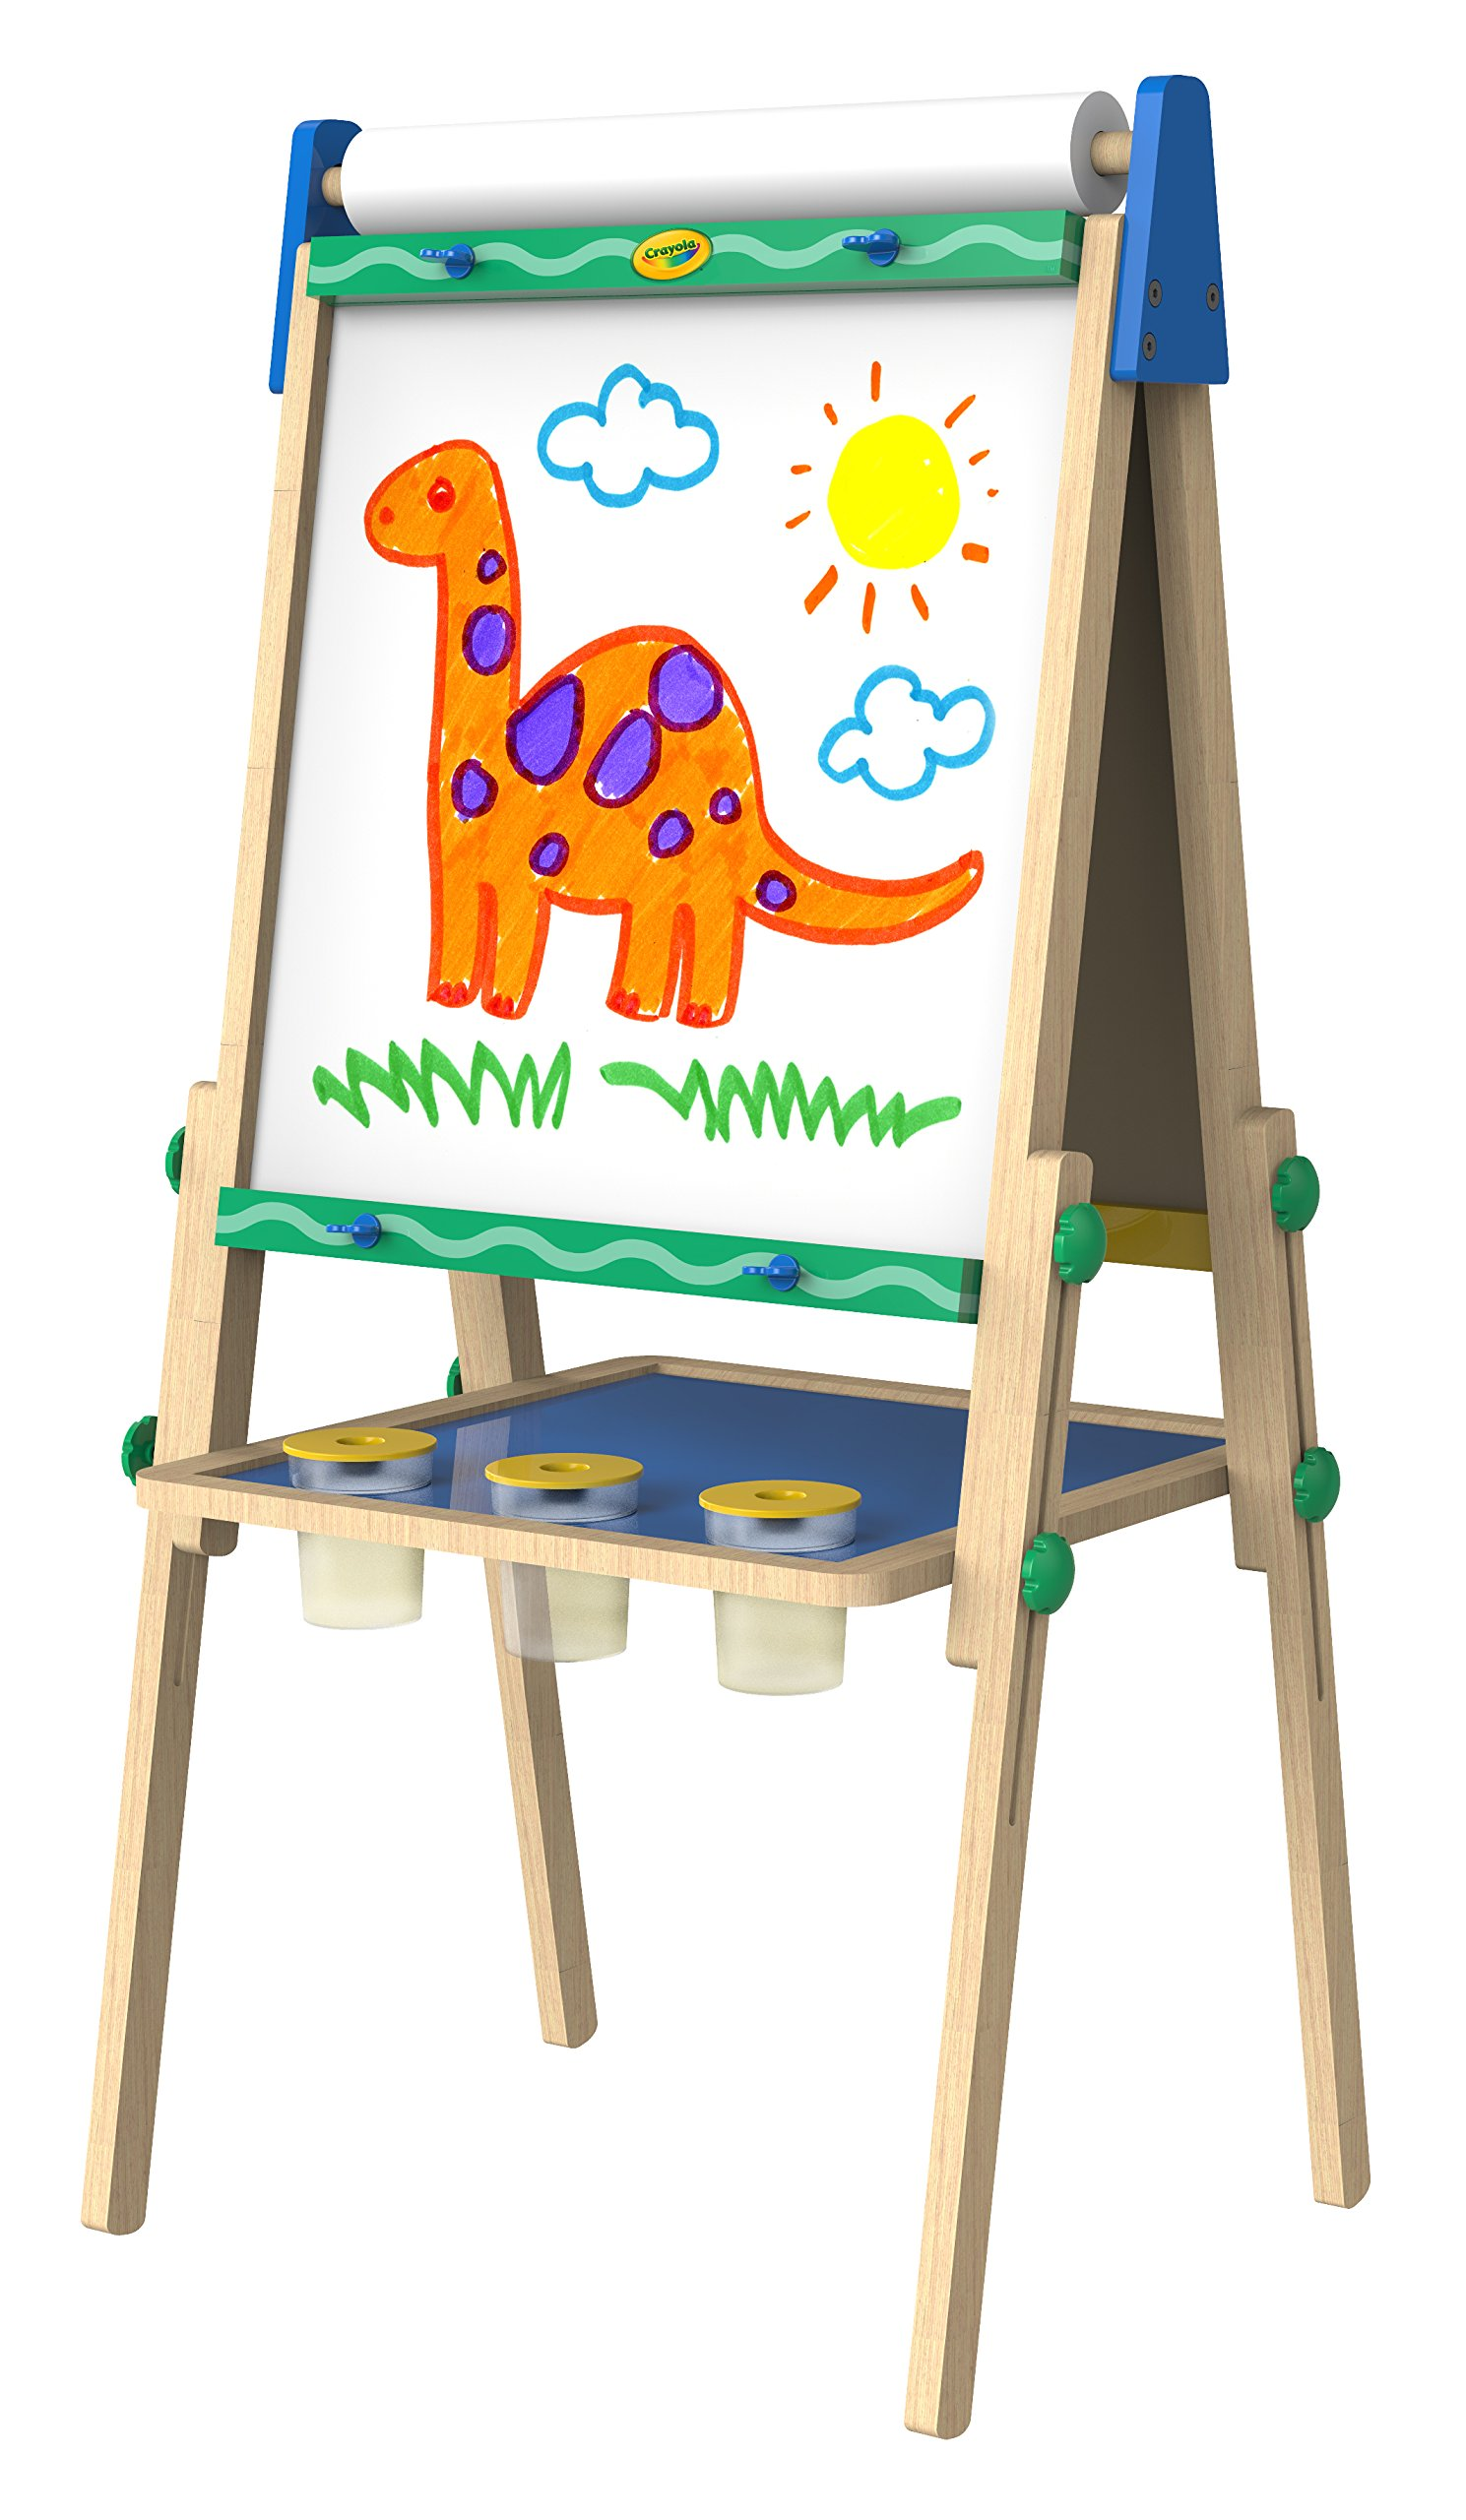 Crayola Kids Wooden Easel, Dry Erase Board & Chalkboard, Amazon Exclusive, Kids Toys, Gift, Age 4, 5, 6, 7